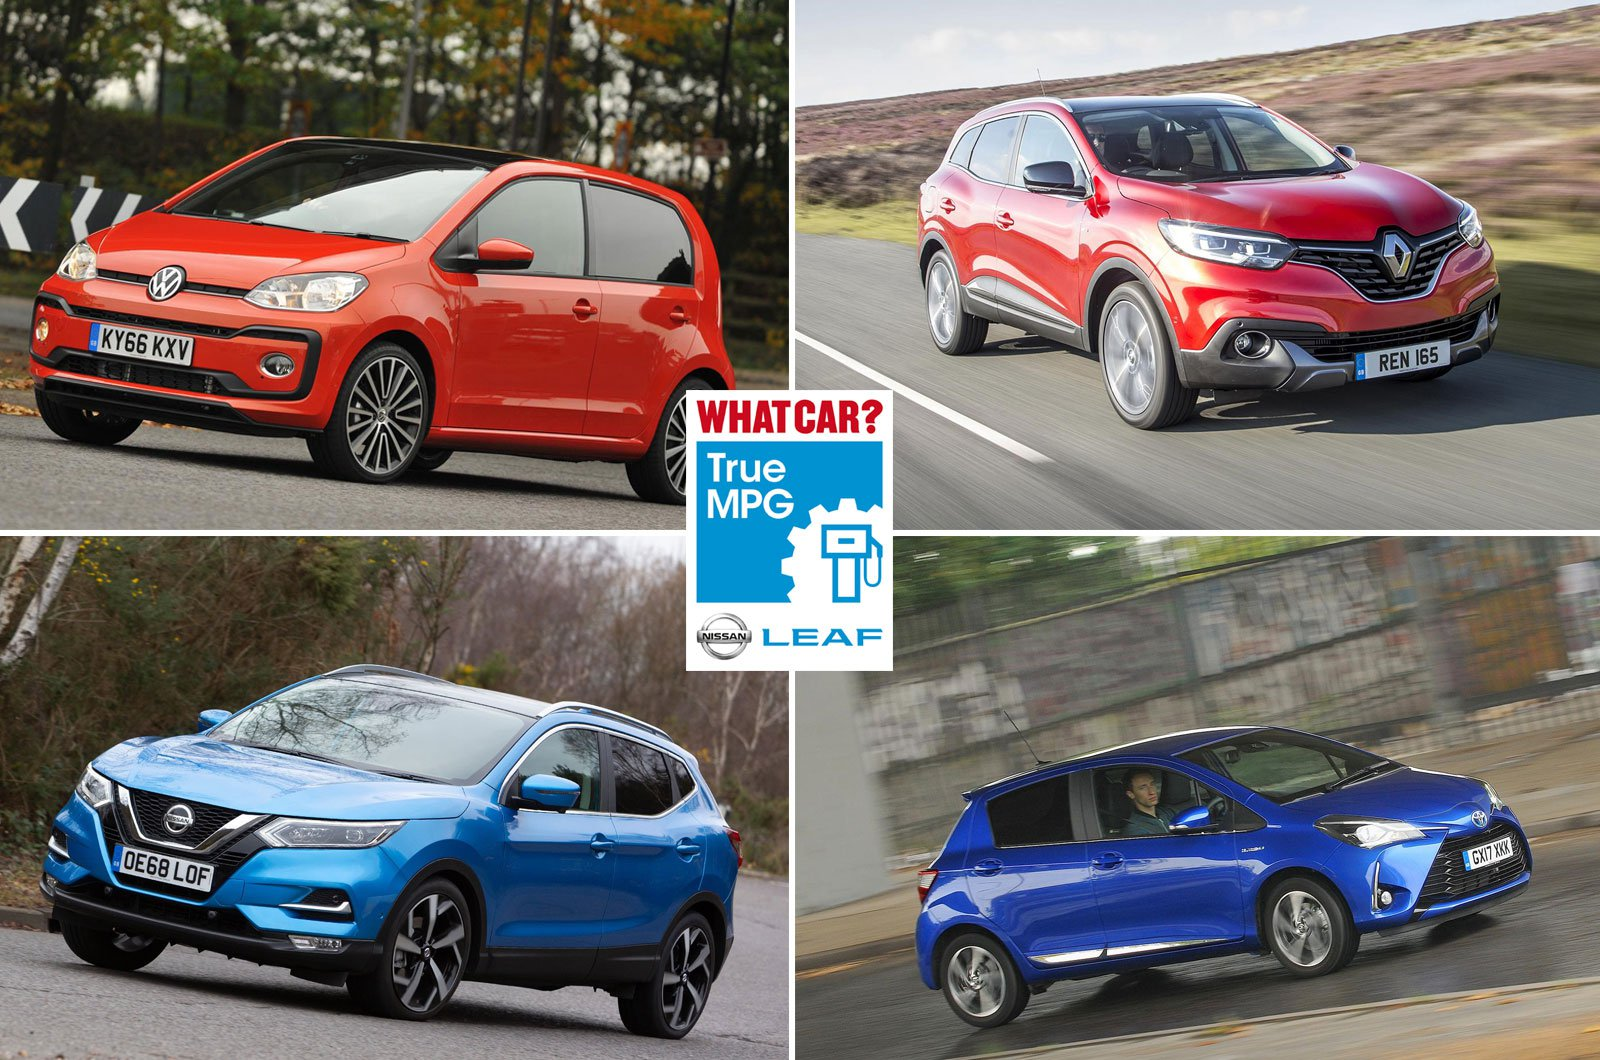 Volkswagen Up, Renault Kadjar, Nissan Qashqai, Toyota Yaris